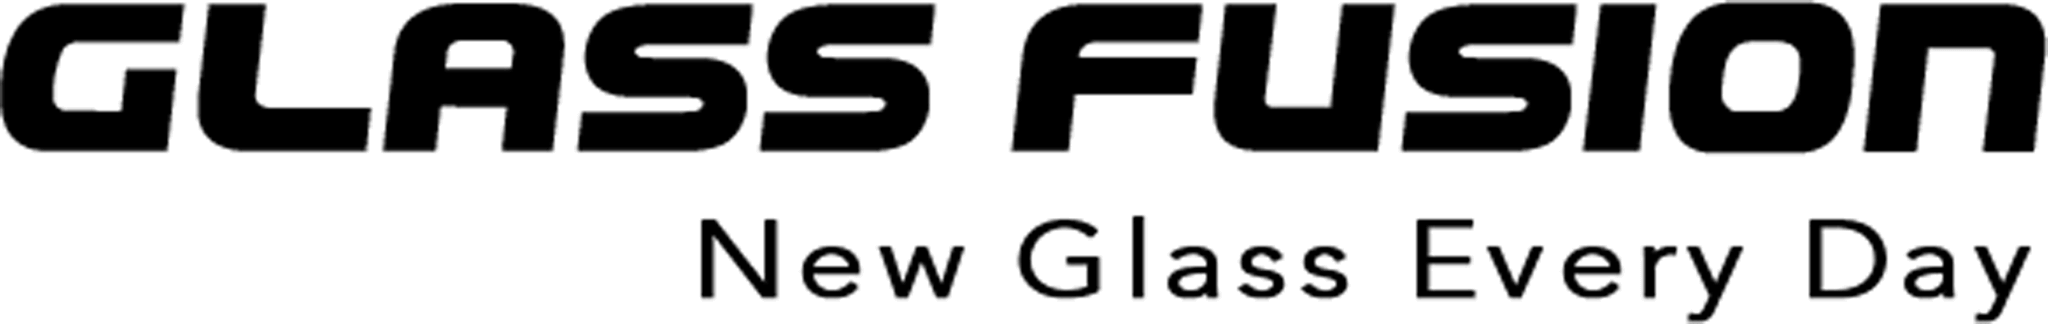 gf_logo_1